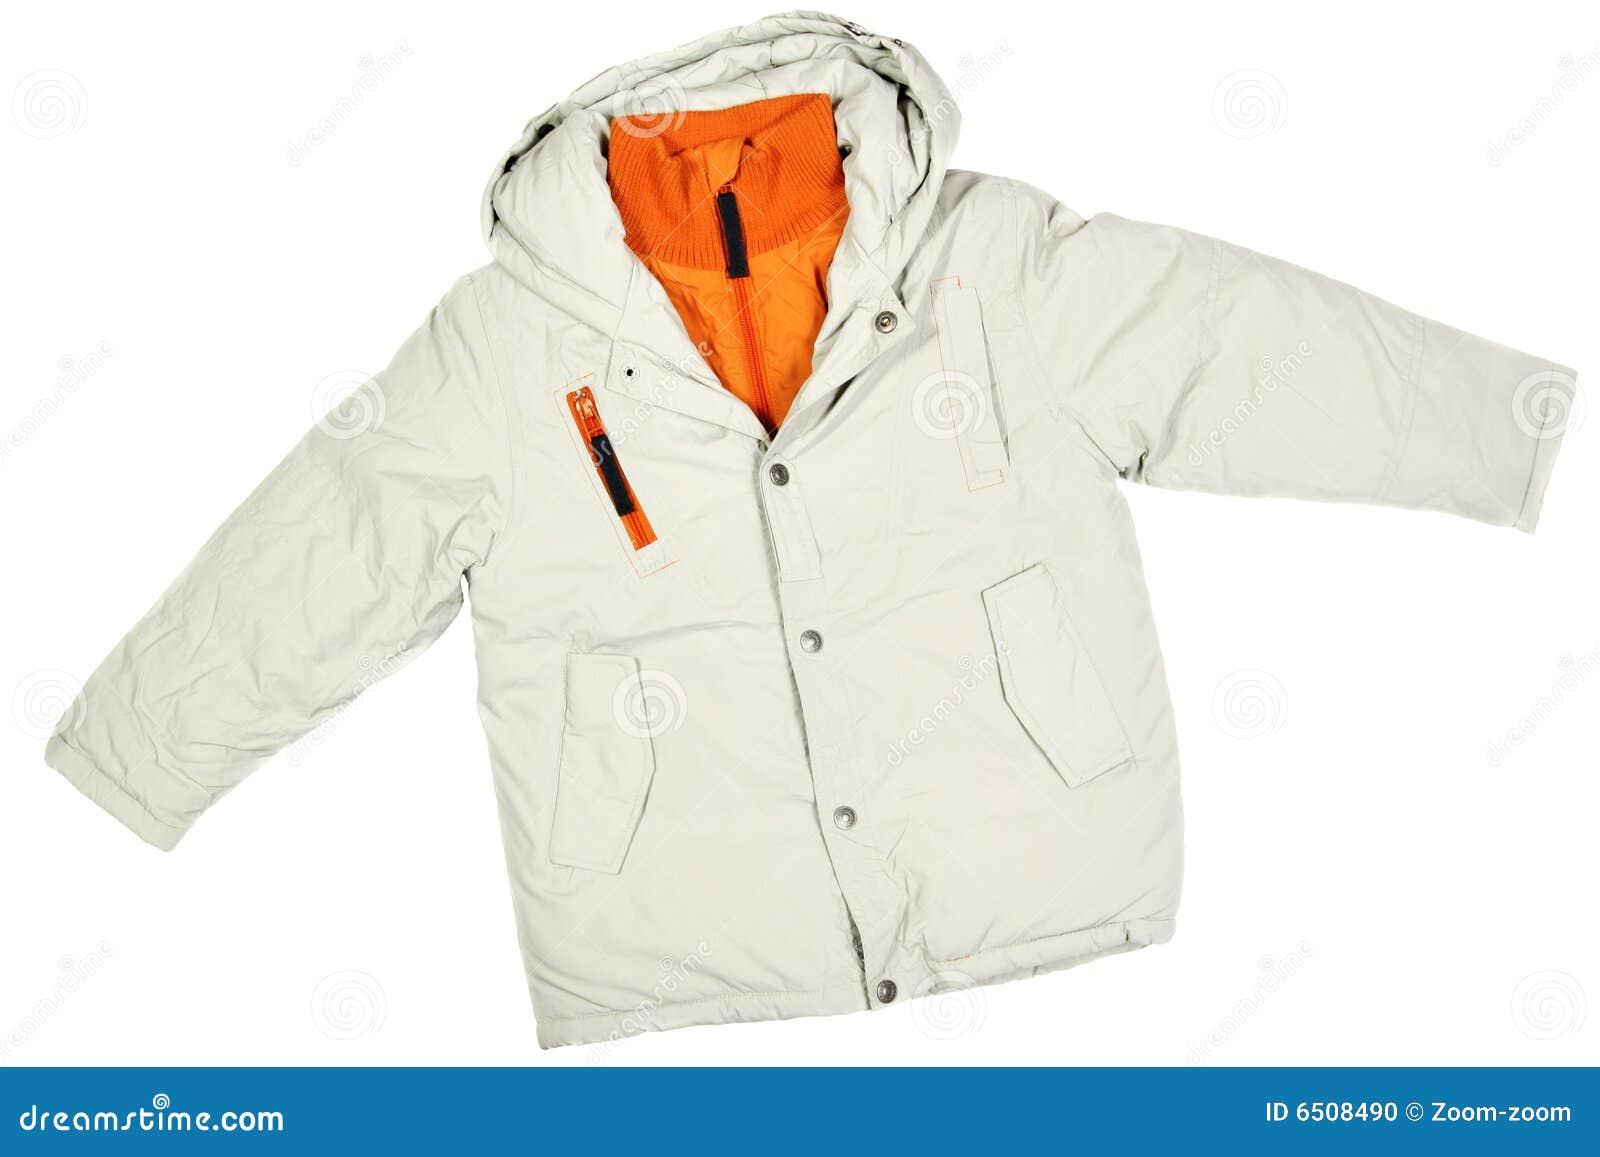 Чистка зимней куртки в домашних условиях